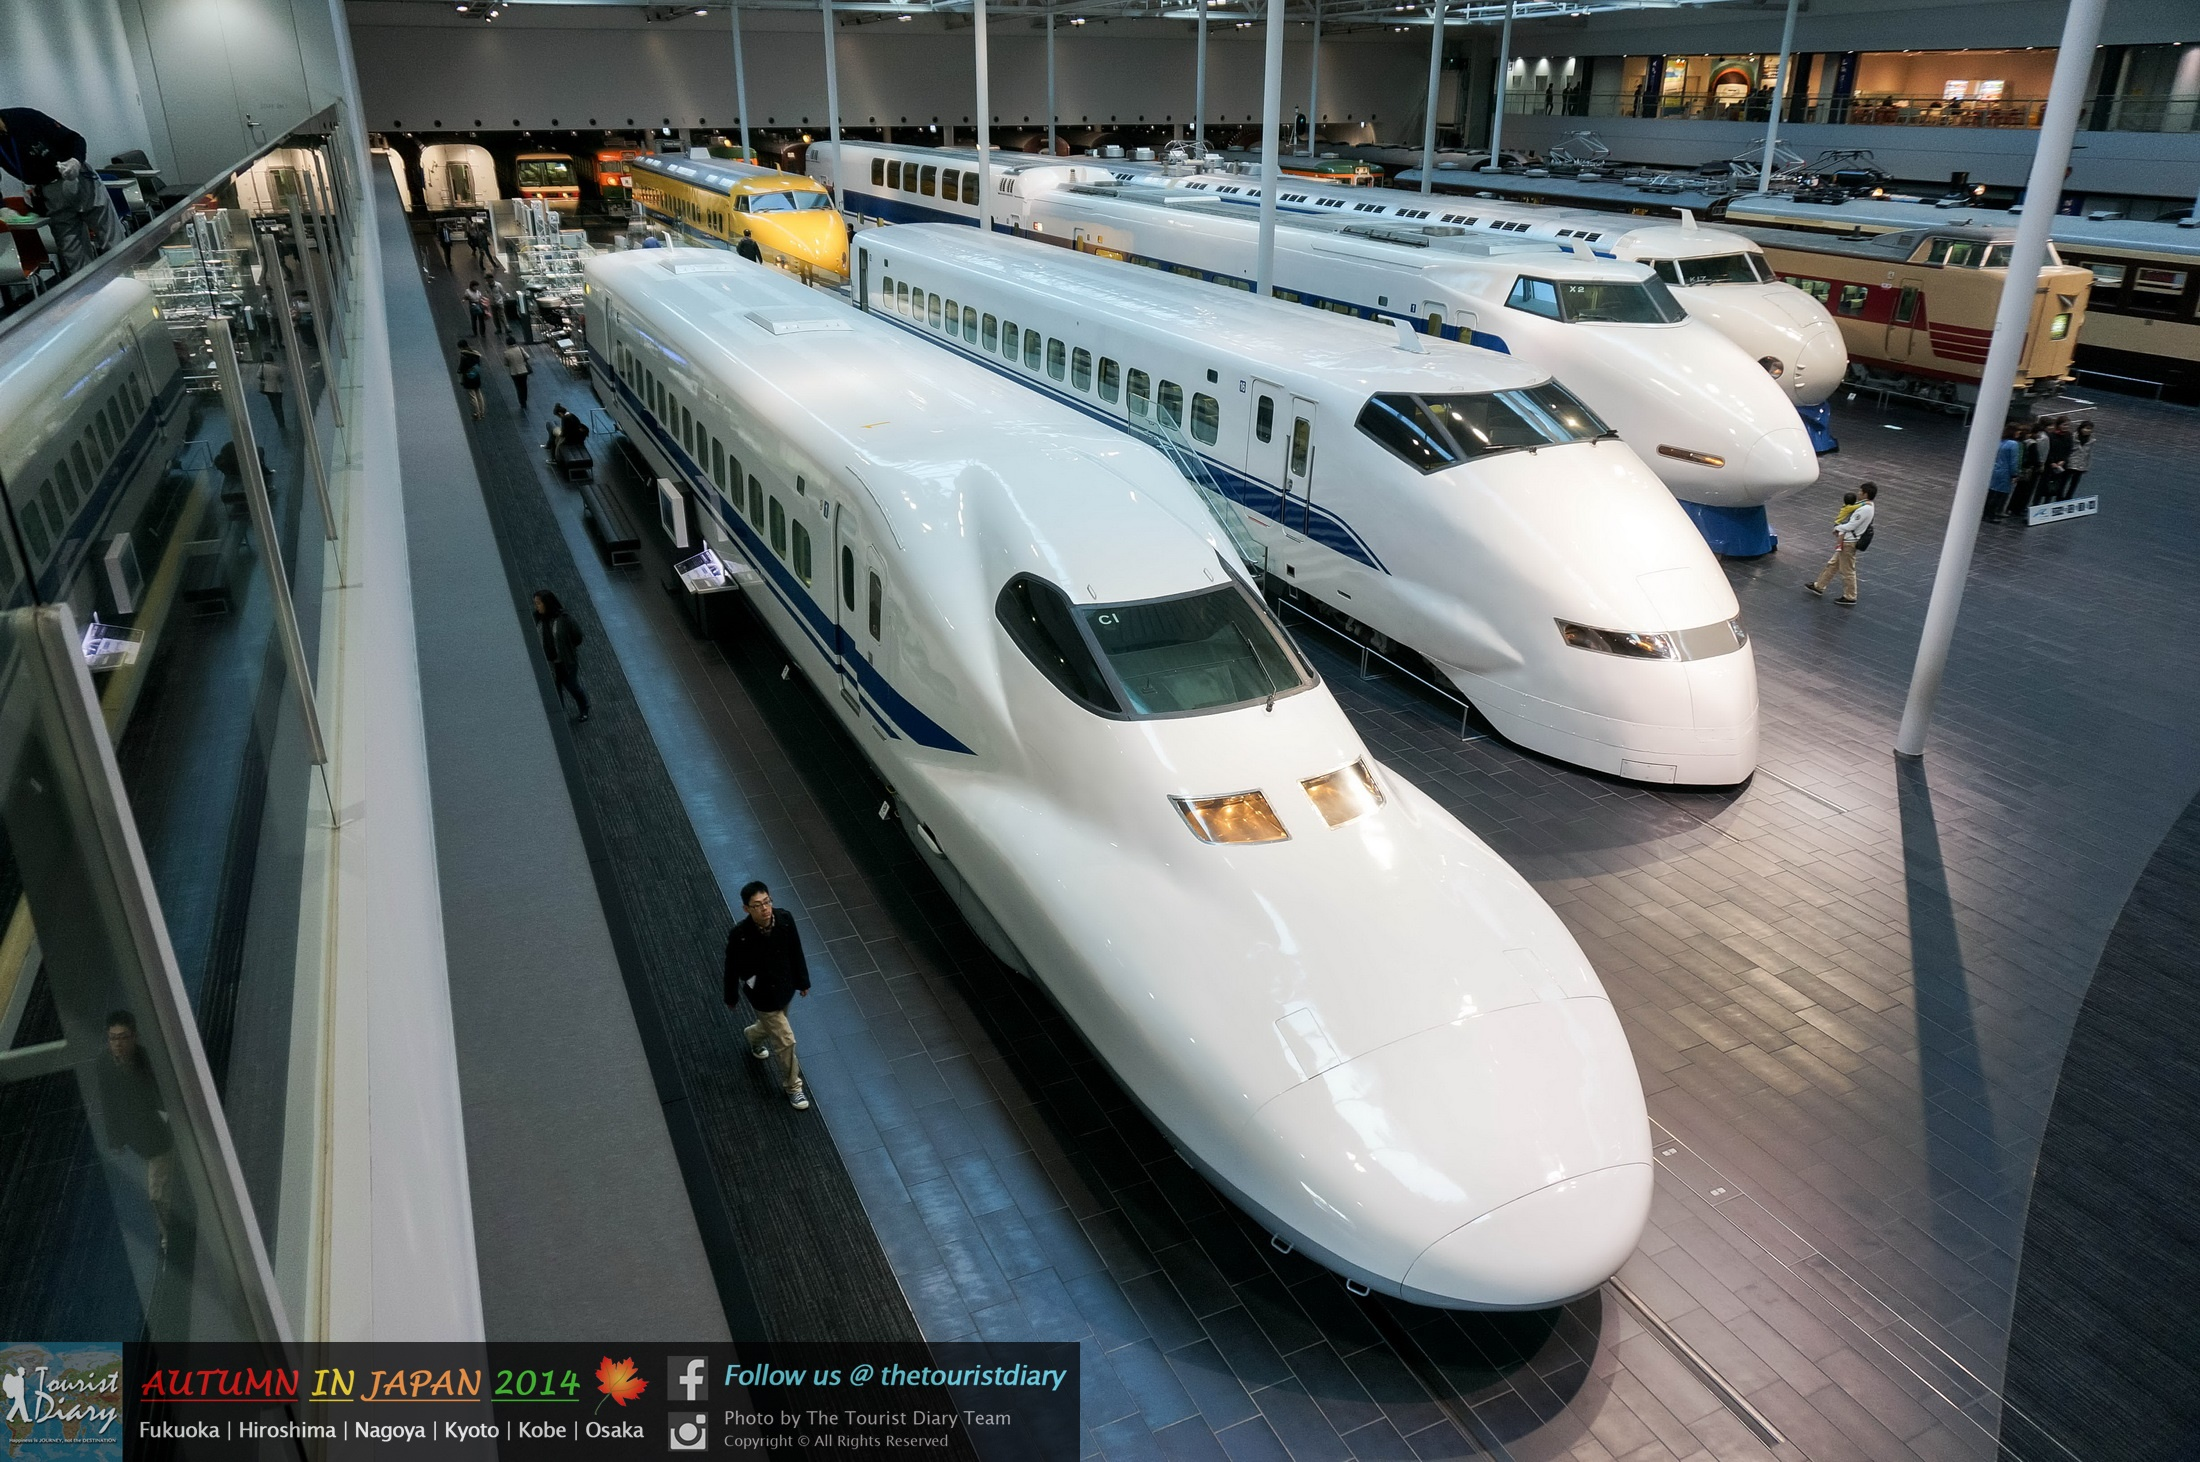 Nagoya | SCMAGLEV and Railway Park พิพิธภัณฑ์รถไฟญี่ปุ่น